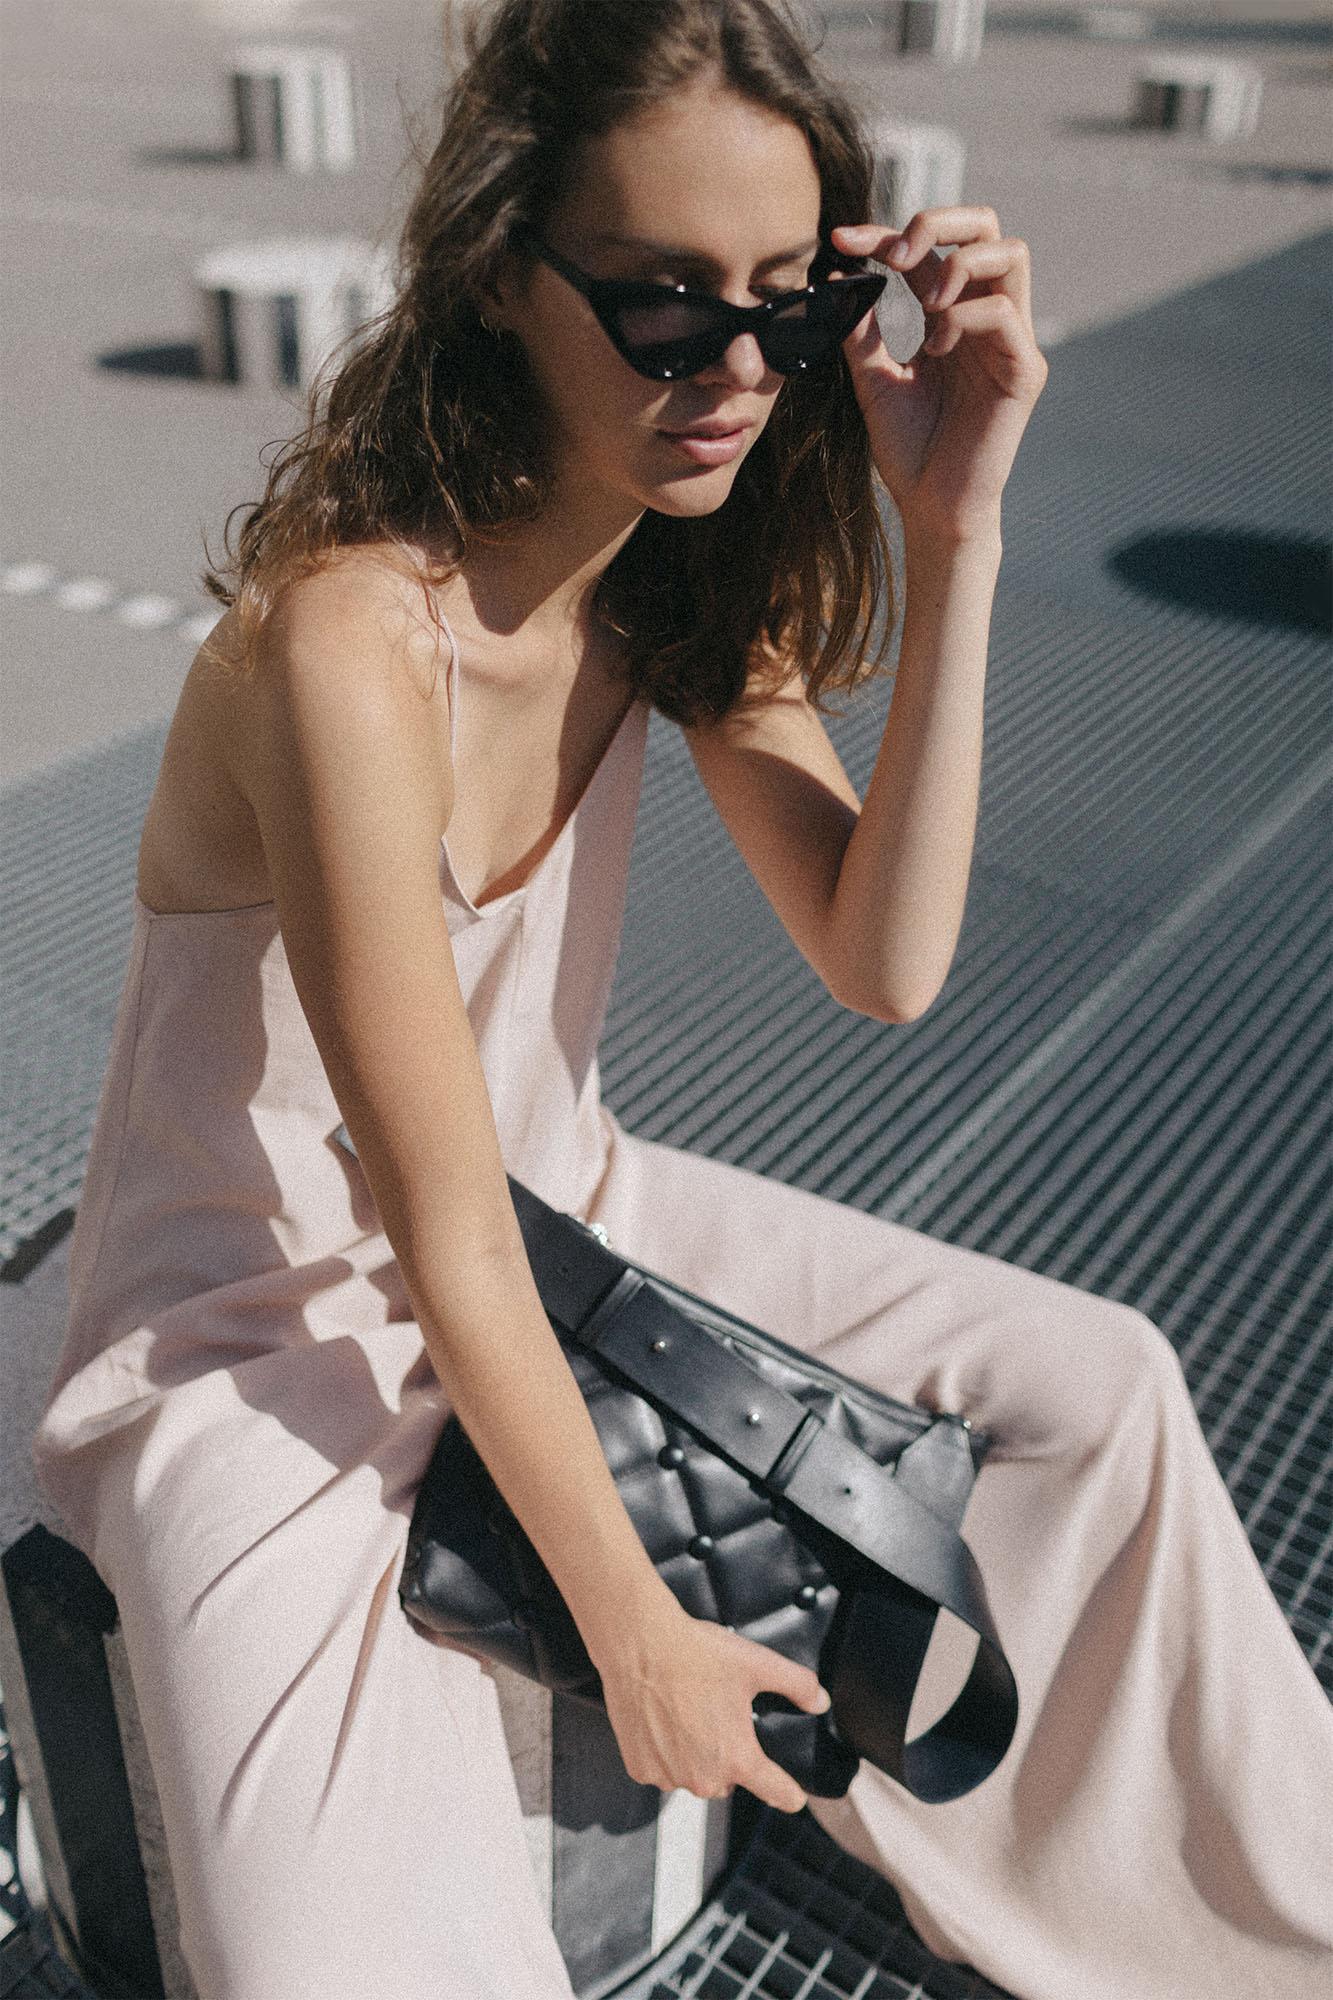 Model sitting on the Colonnes de Buren in Palais Royal with Laimushka black leather handbag